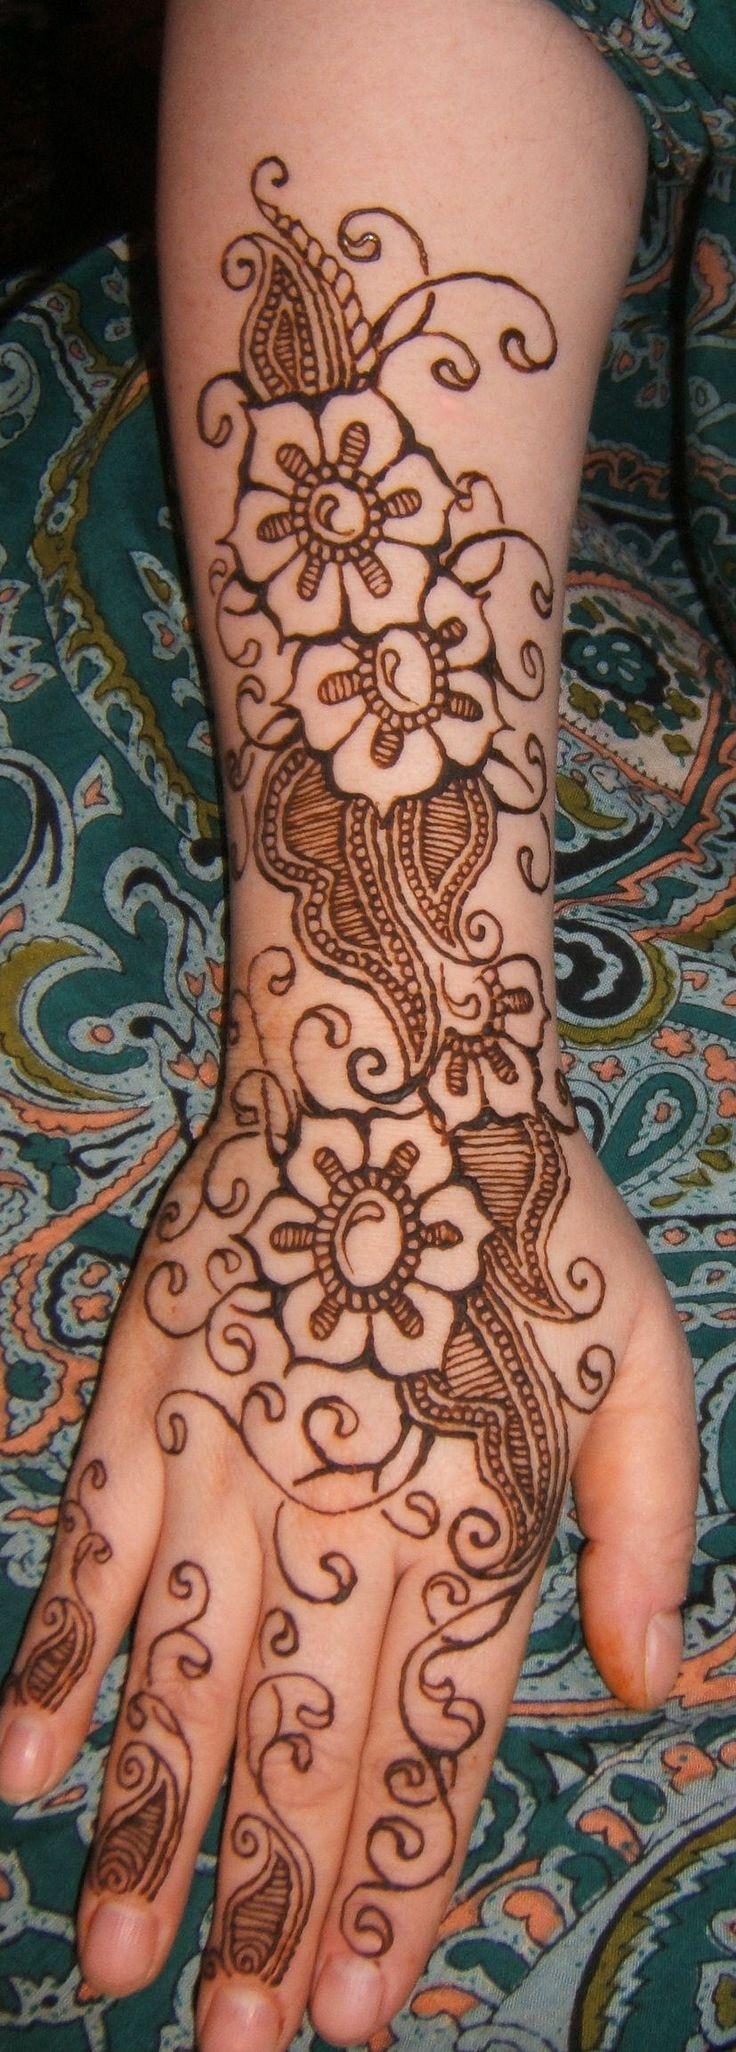 Henna Tattoo Winnipeg : Bridal mehndi henna designs winnipeg by hasina